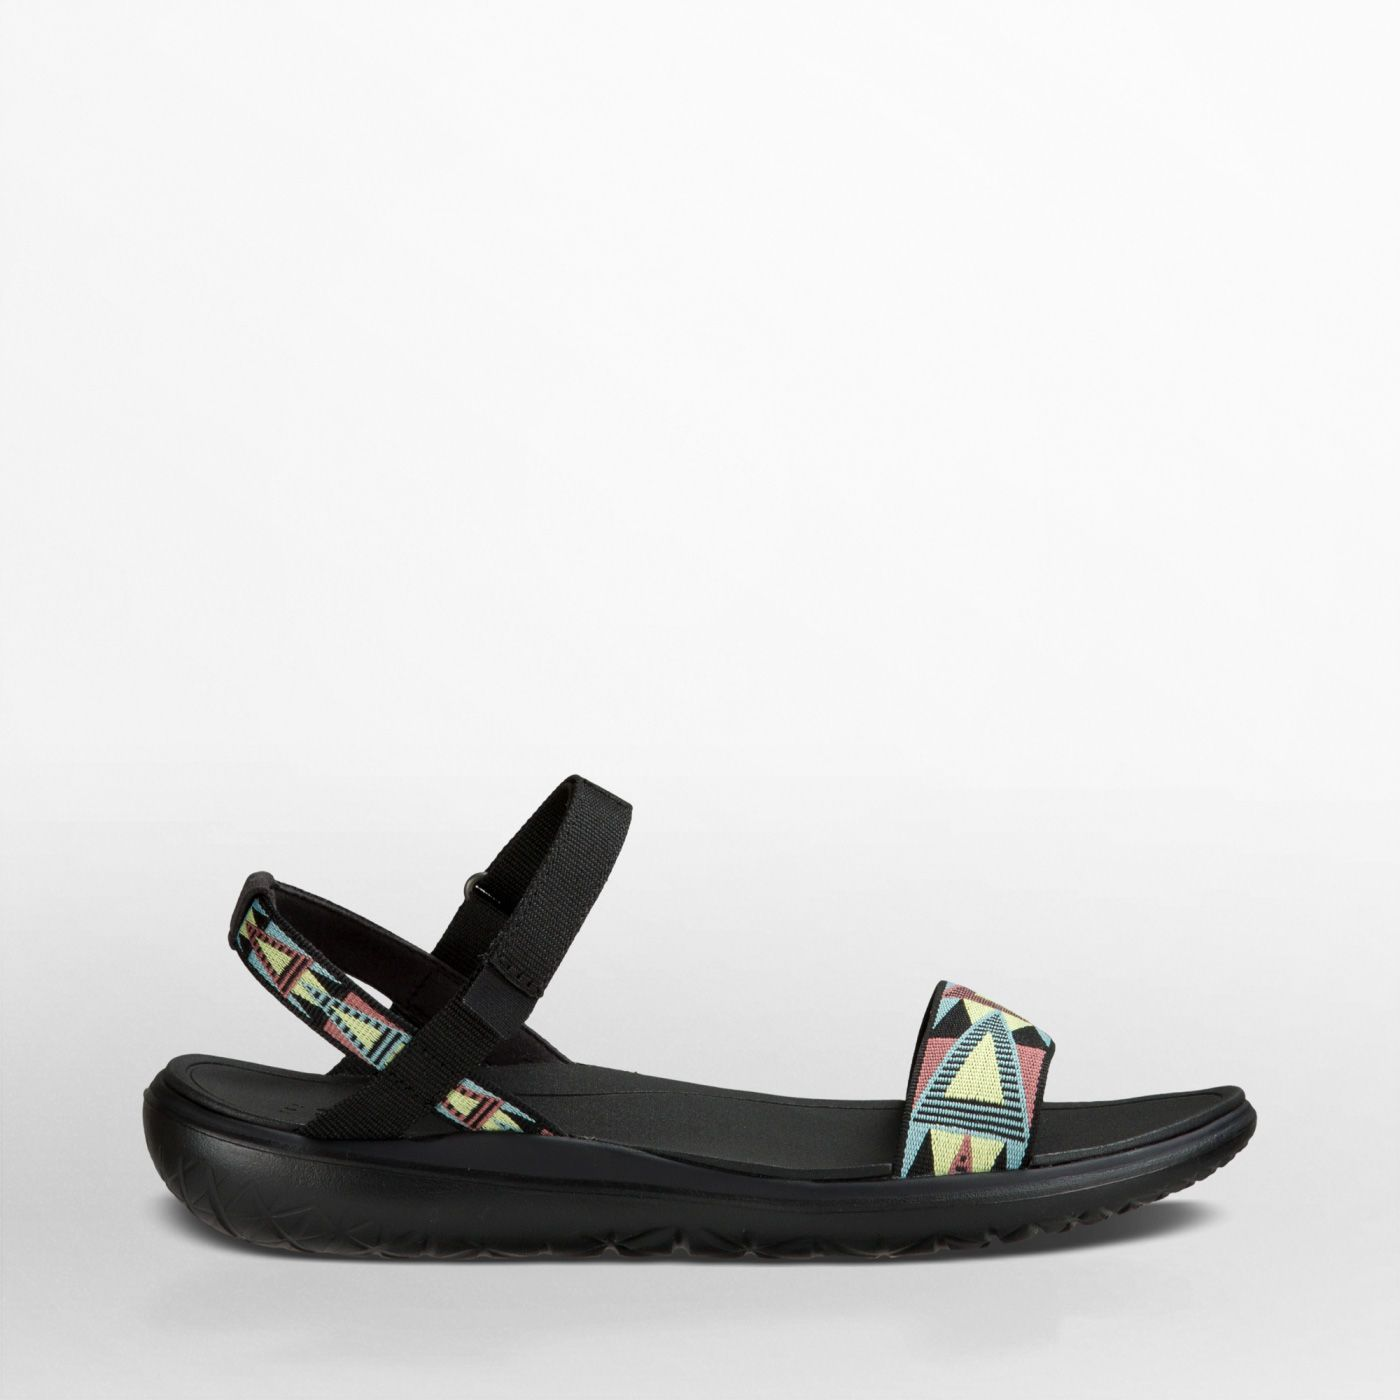 44c9dd9daa0a Teva® Women s Terra-Float Nova Sandals